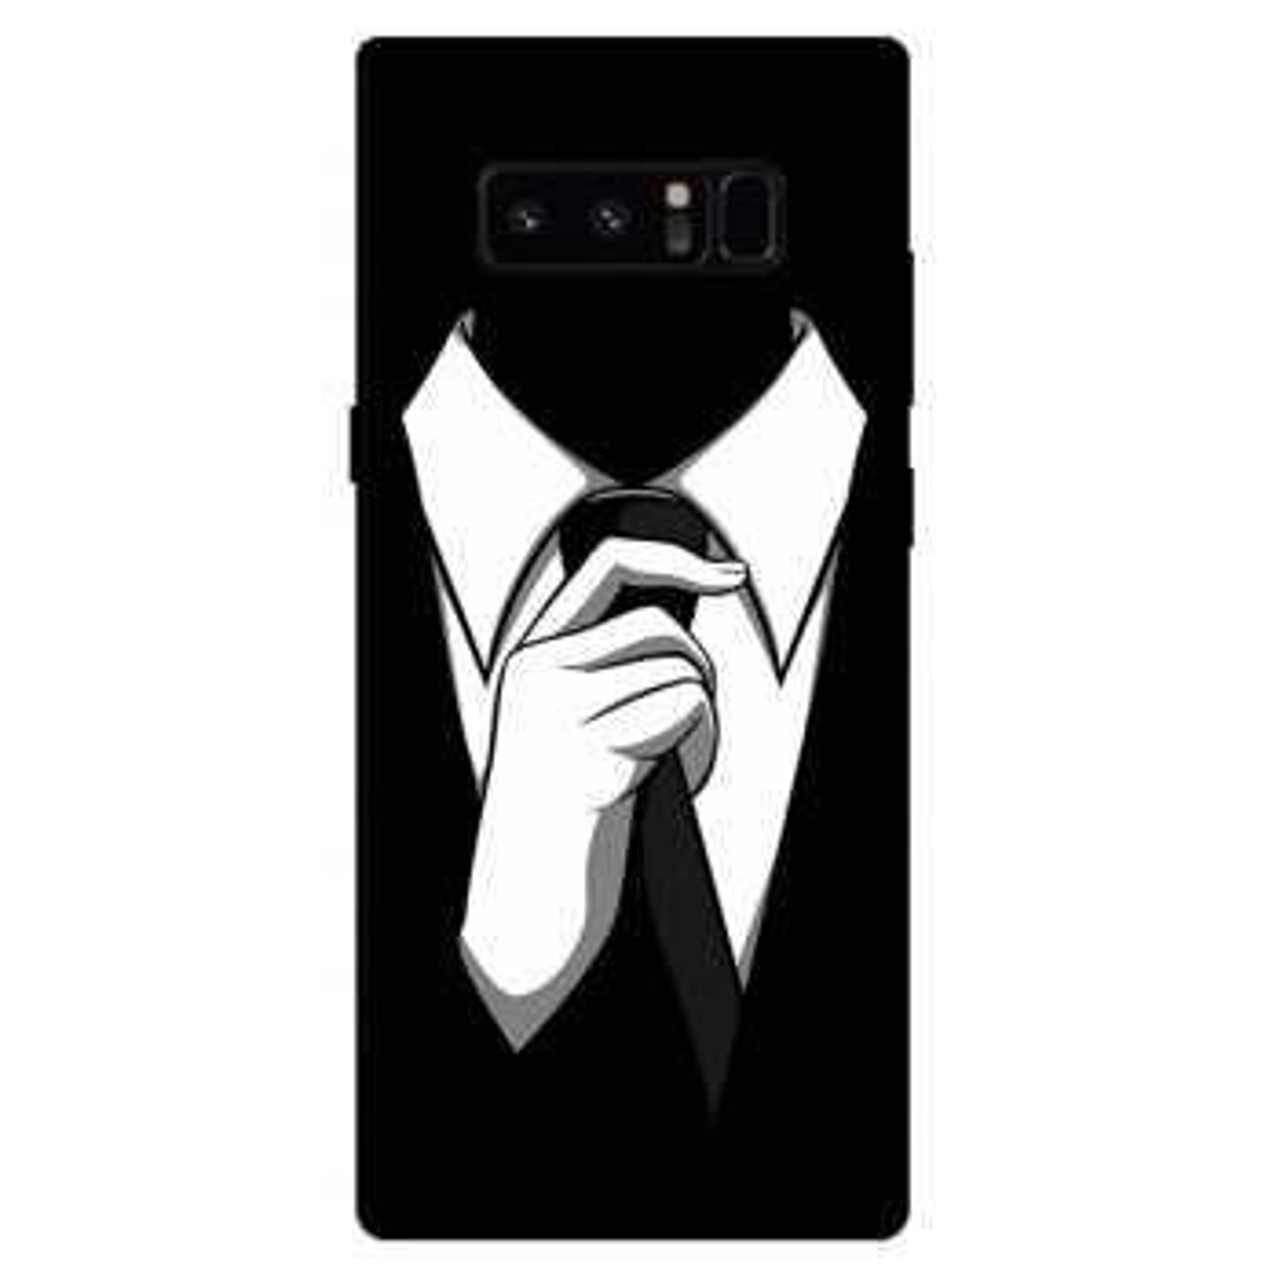 کاور کی اچ مدل 7131 مناسب برای گوشی موبایل سامسونگ گلکسی  Note 8